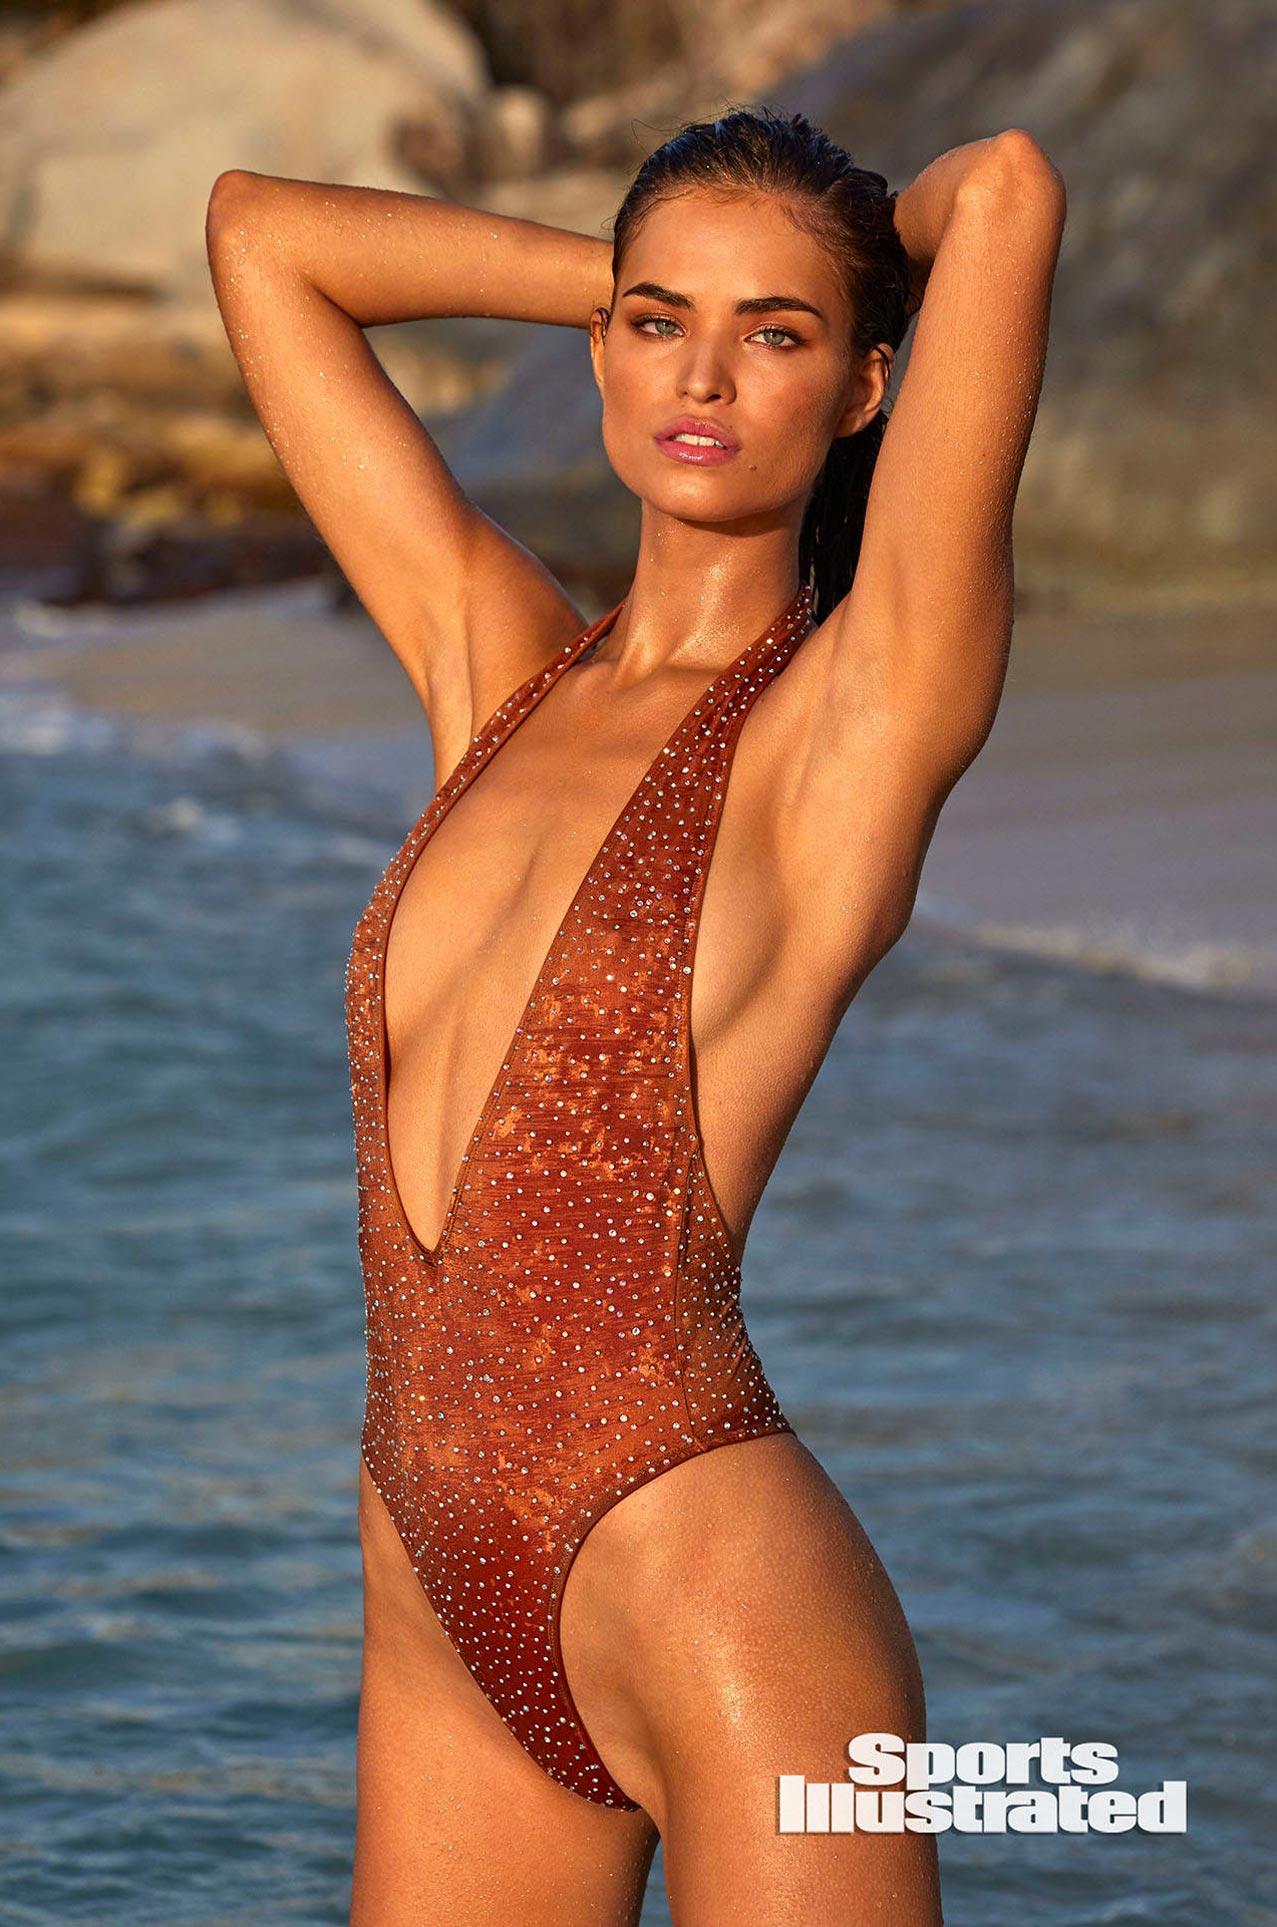 Робин Хольцкен в каталоге купальников Sports Illustrated Swimsuit 2020 / фото 22